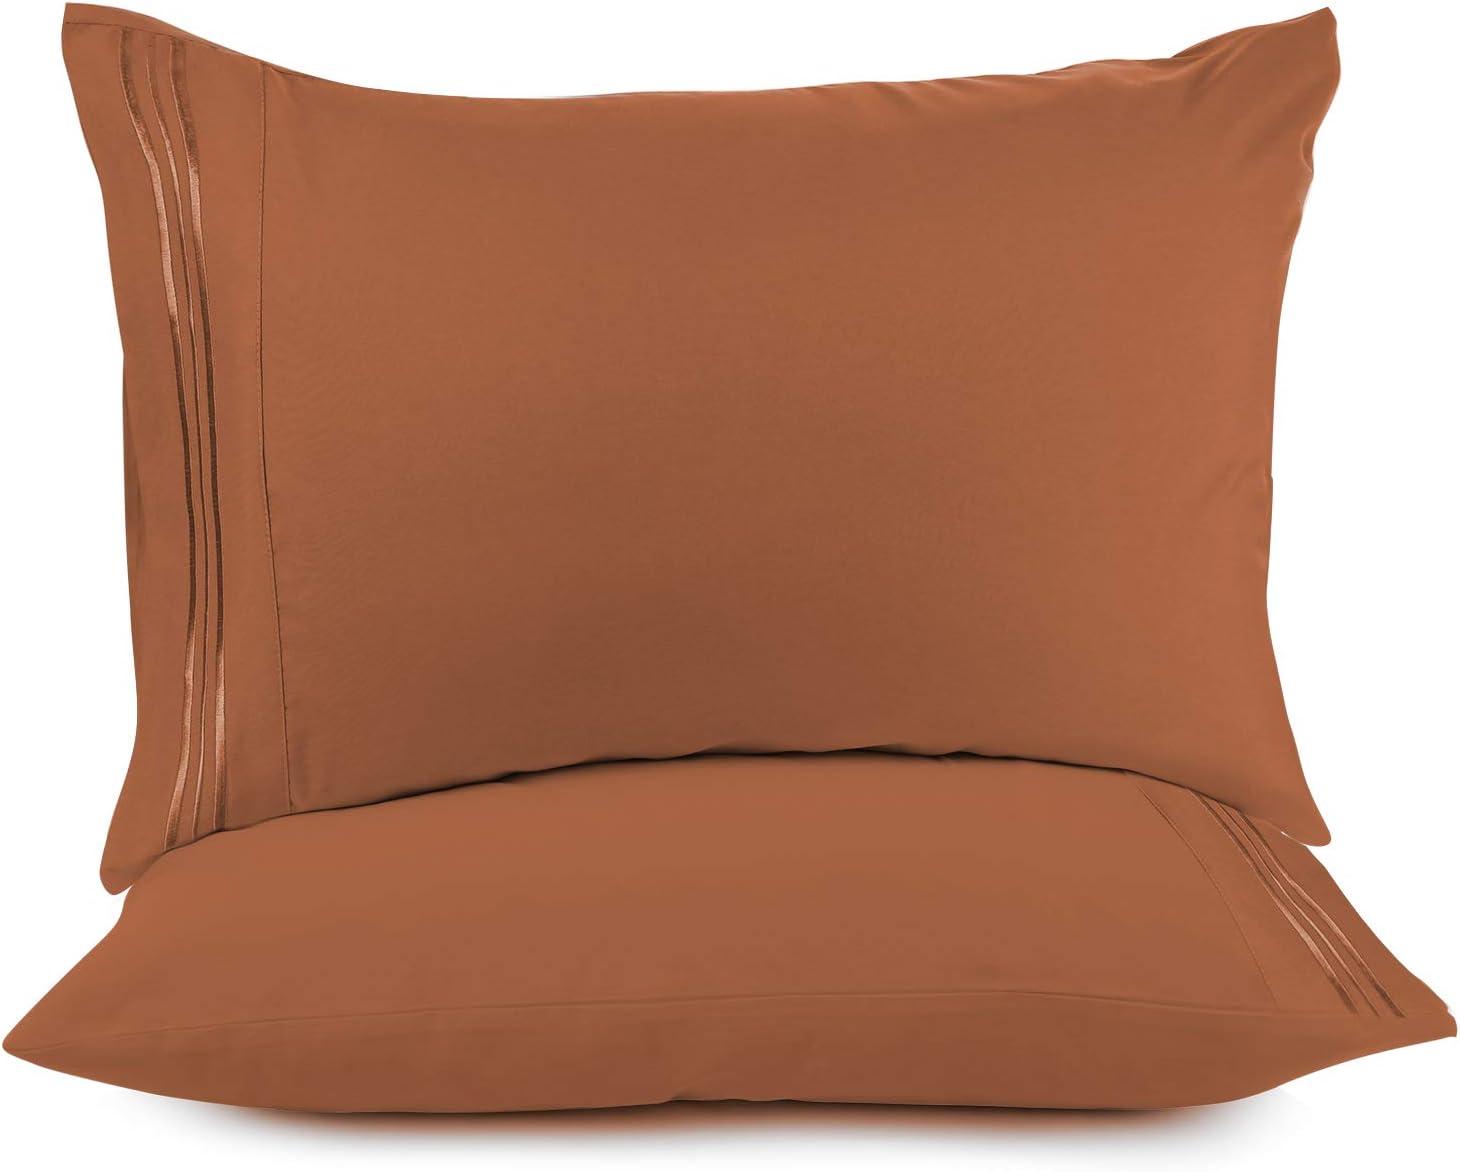 Nestl Bedding Solid Microfiber Queen/Standard 20 x 30 Inches Pillowcases, Orange Rust (Set of 2)